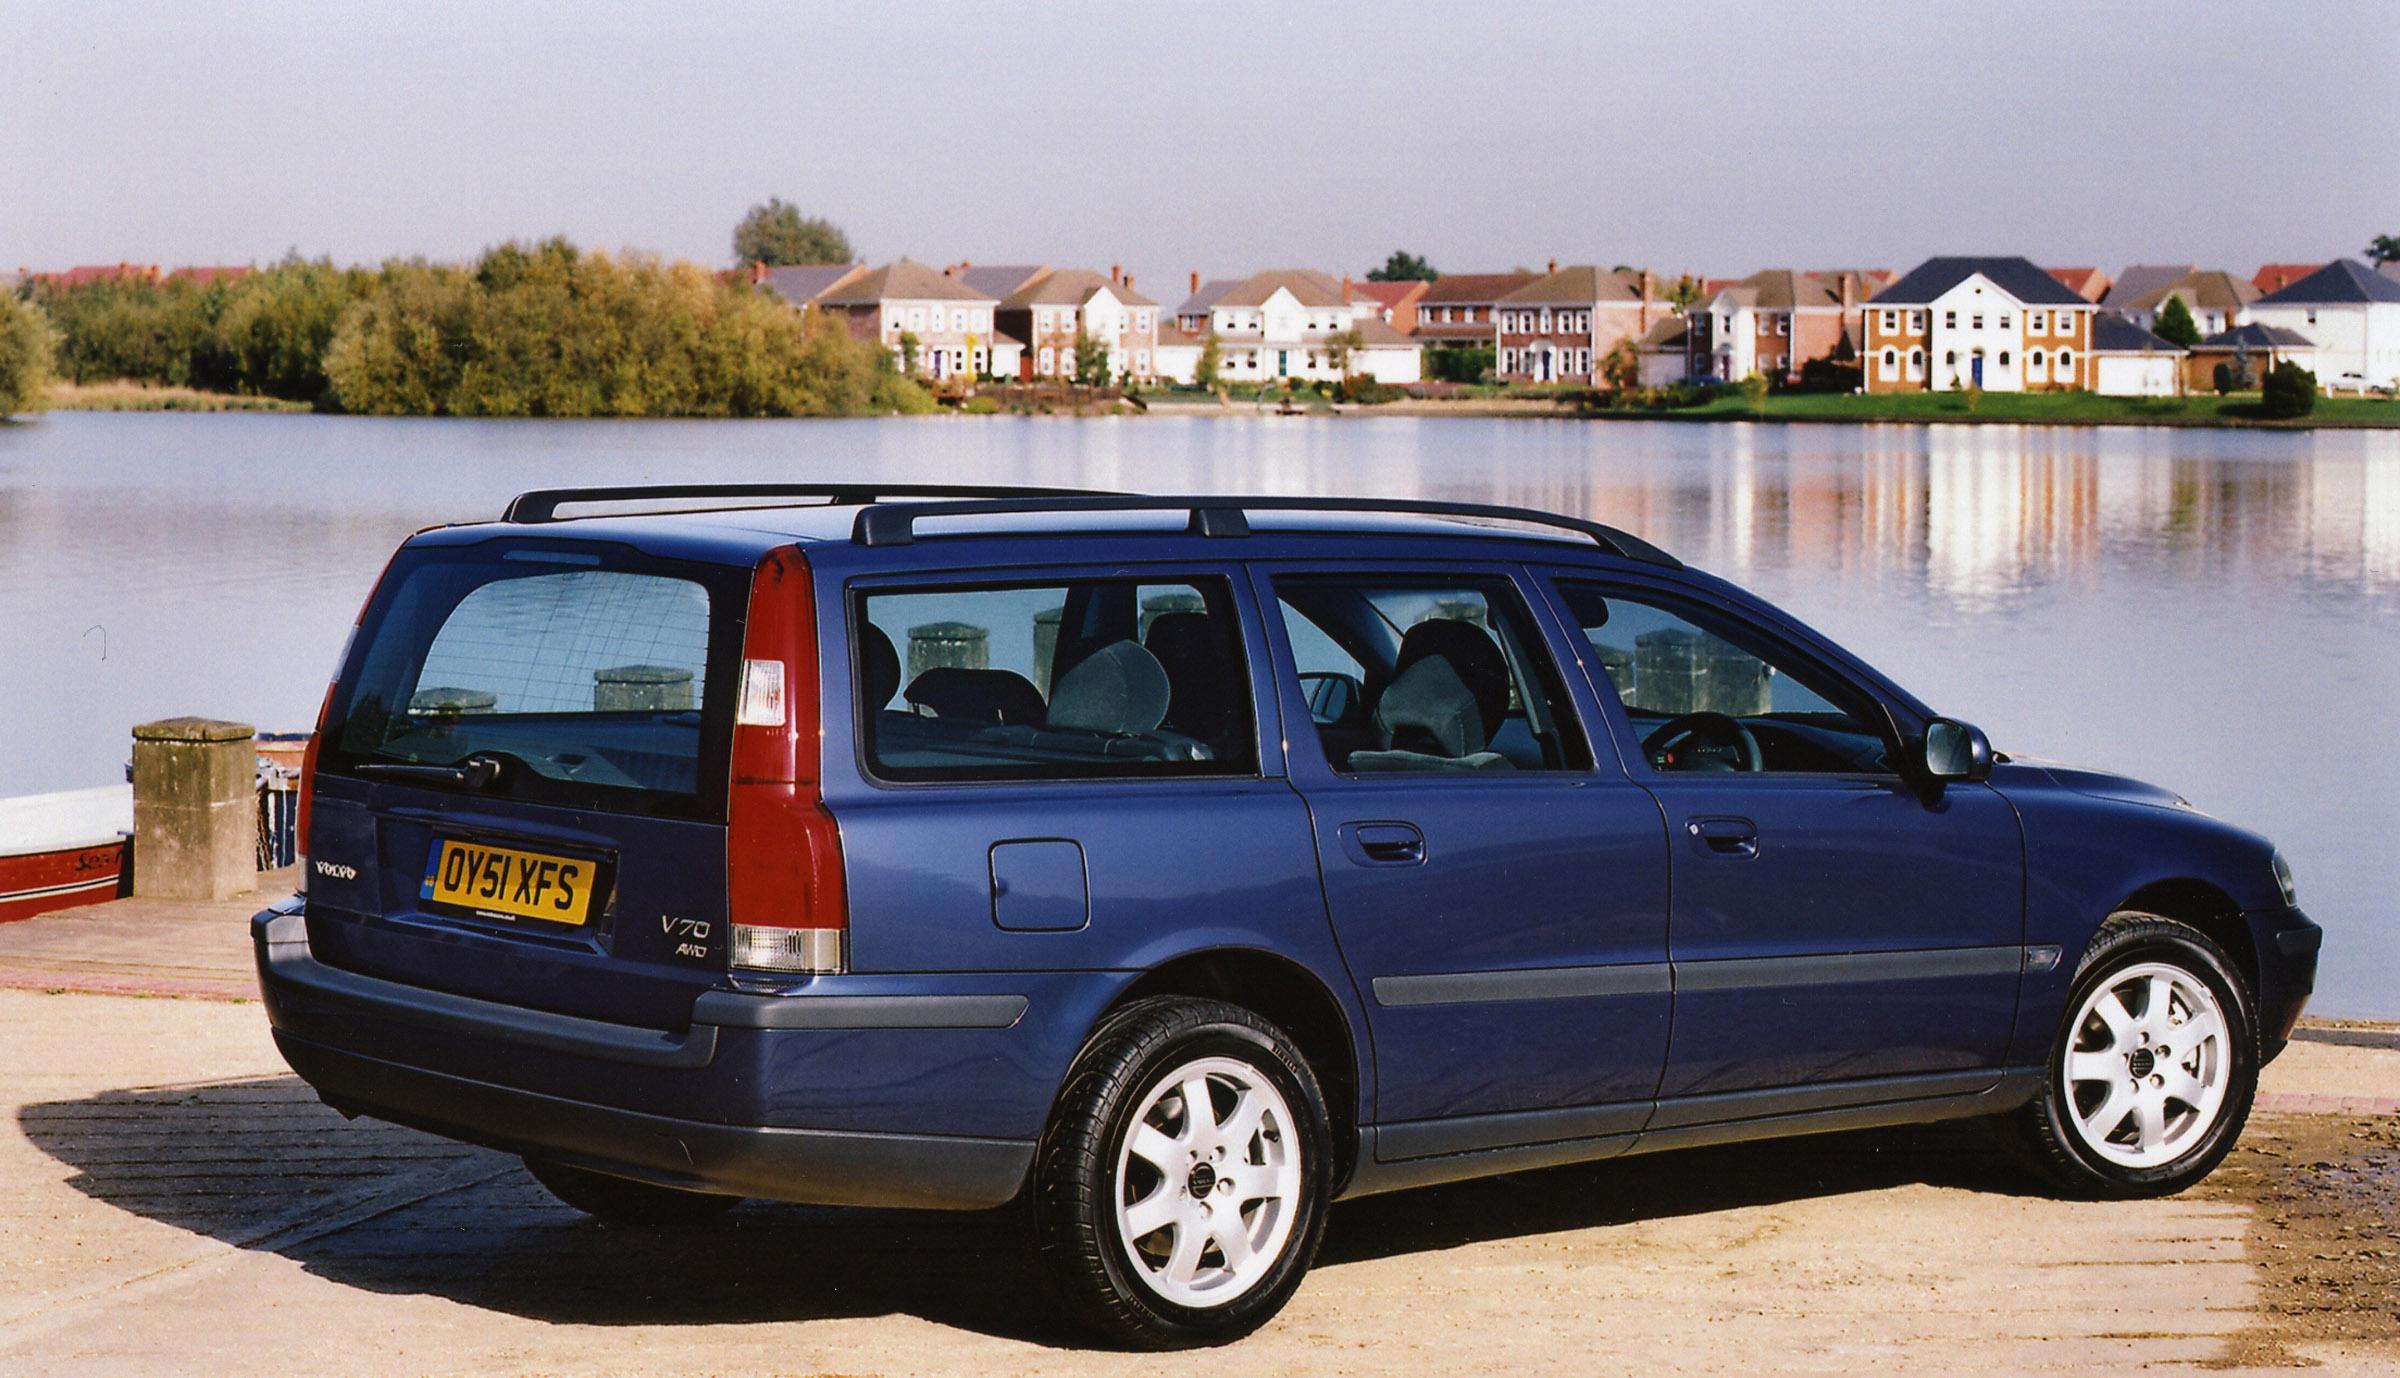 Volvo V70 2001 - Picture 14178